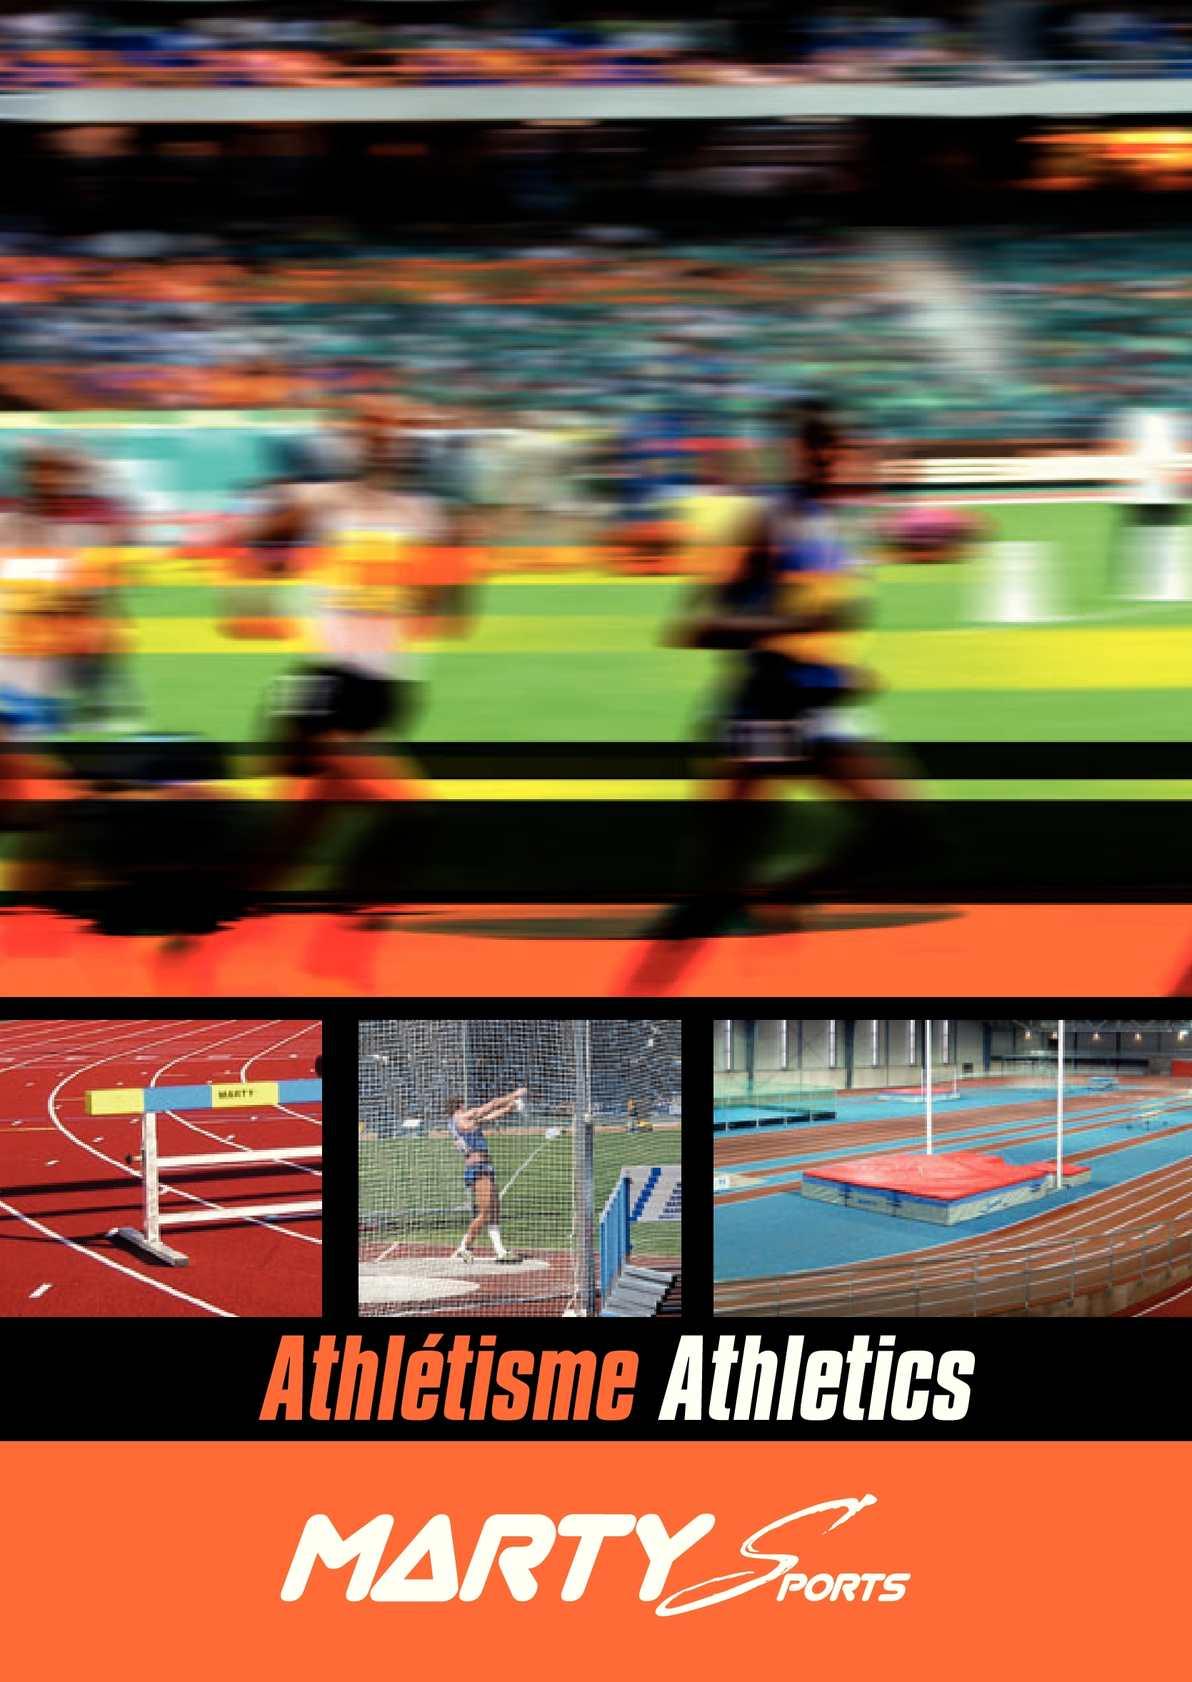 57fb553d520a Calaméo - catalogue Marty Athletisme 2014